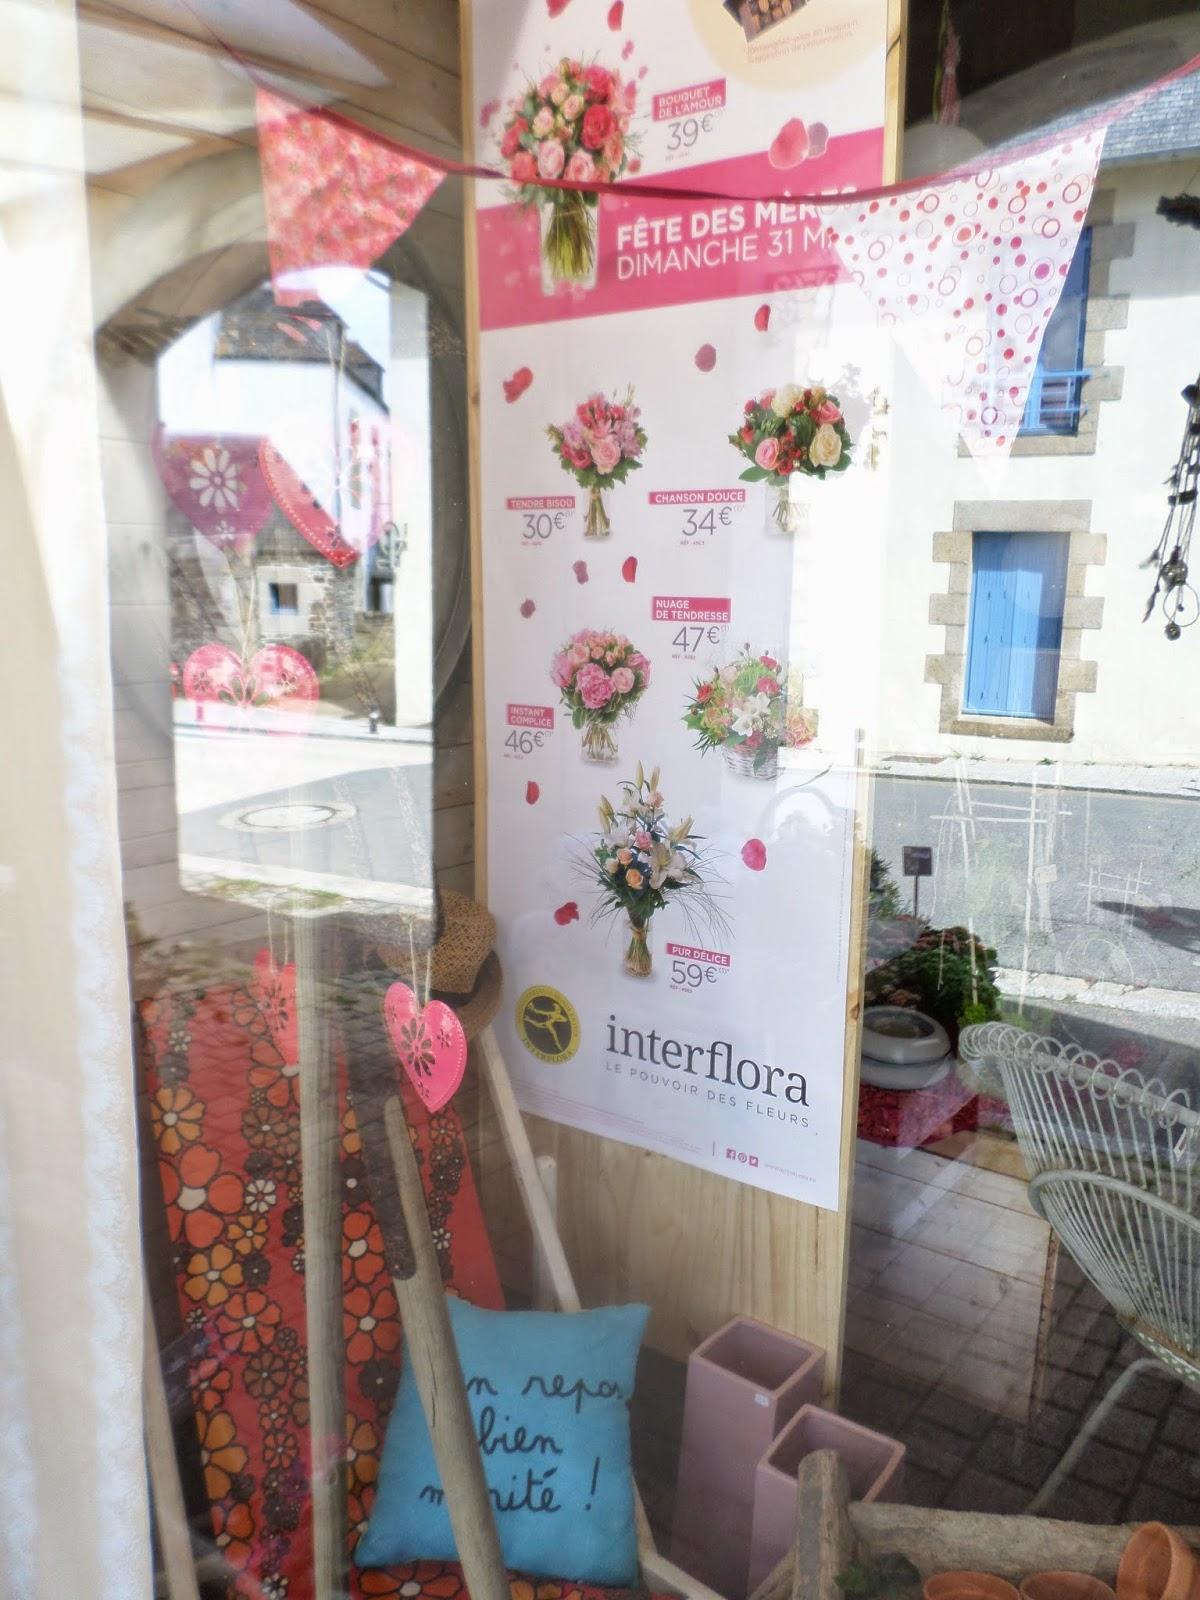 Ma tre artisan fleuriste samedi 30 et dimanche 31 mai c for Fleuriste dimanche